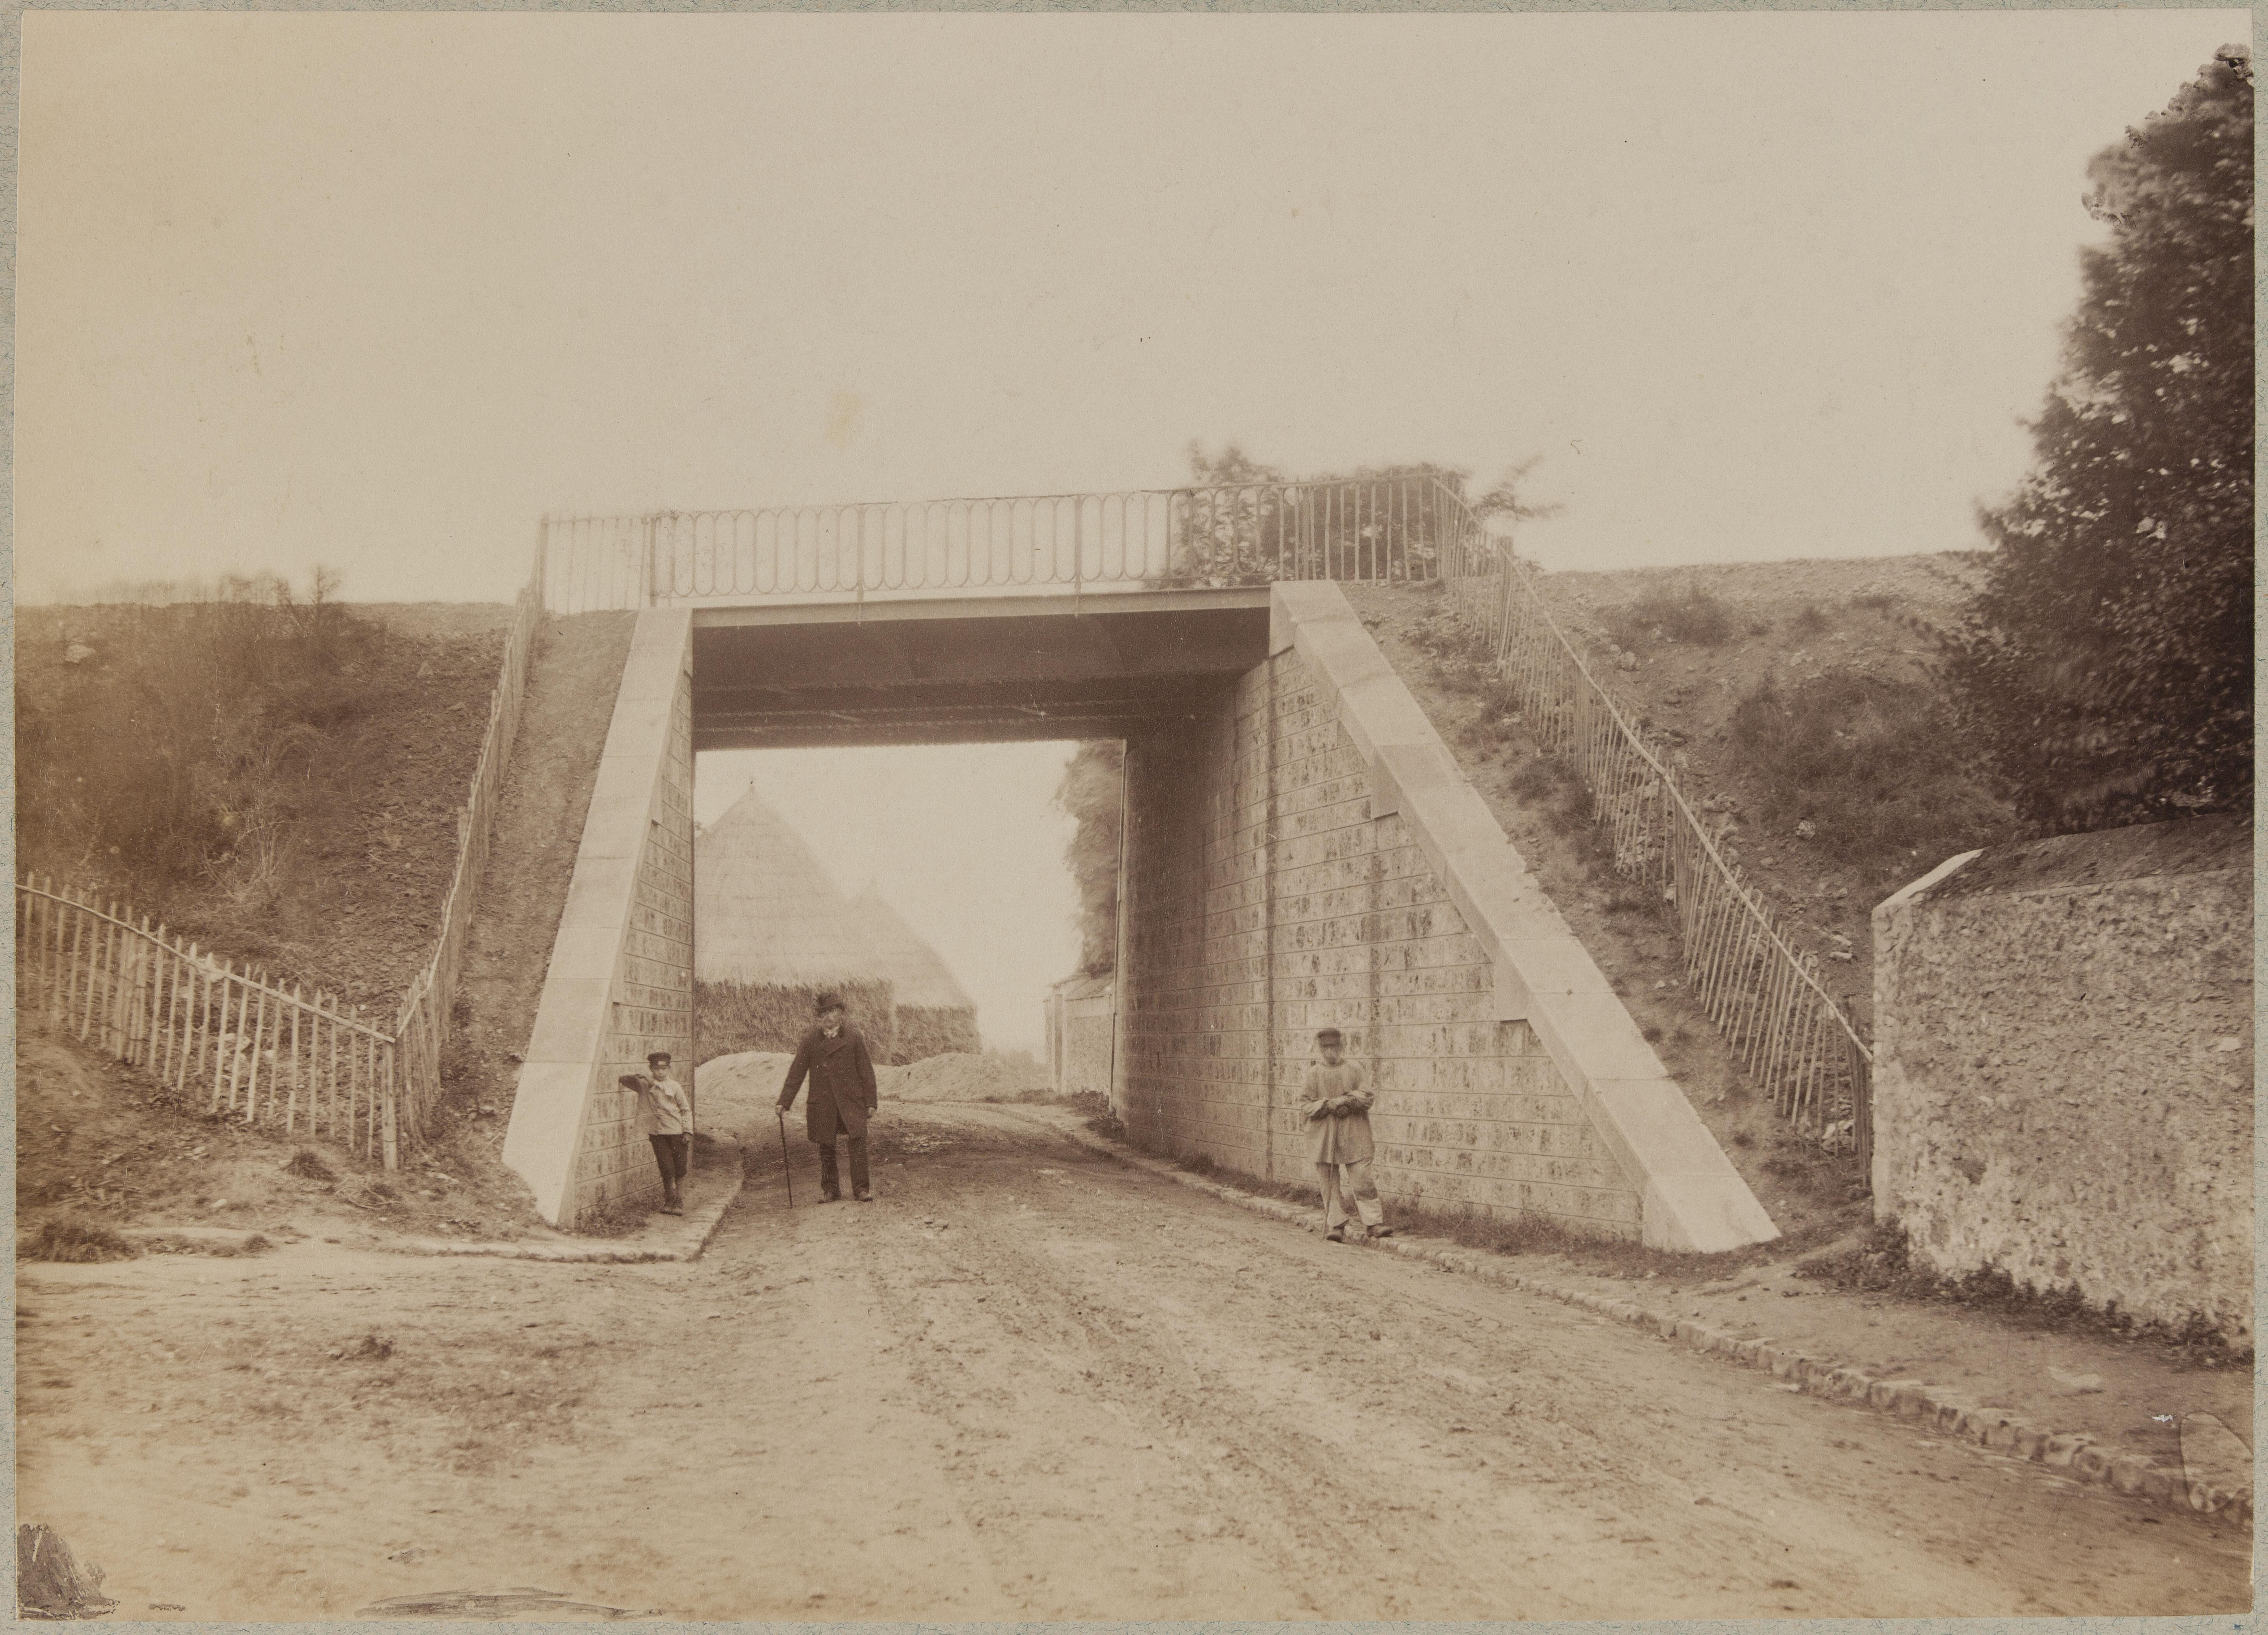 Нижний путепровод возле Орли